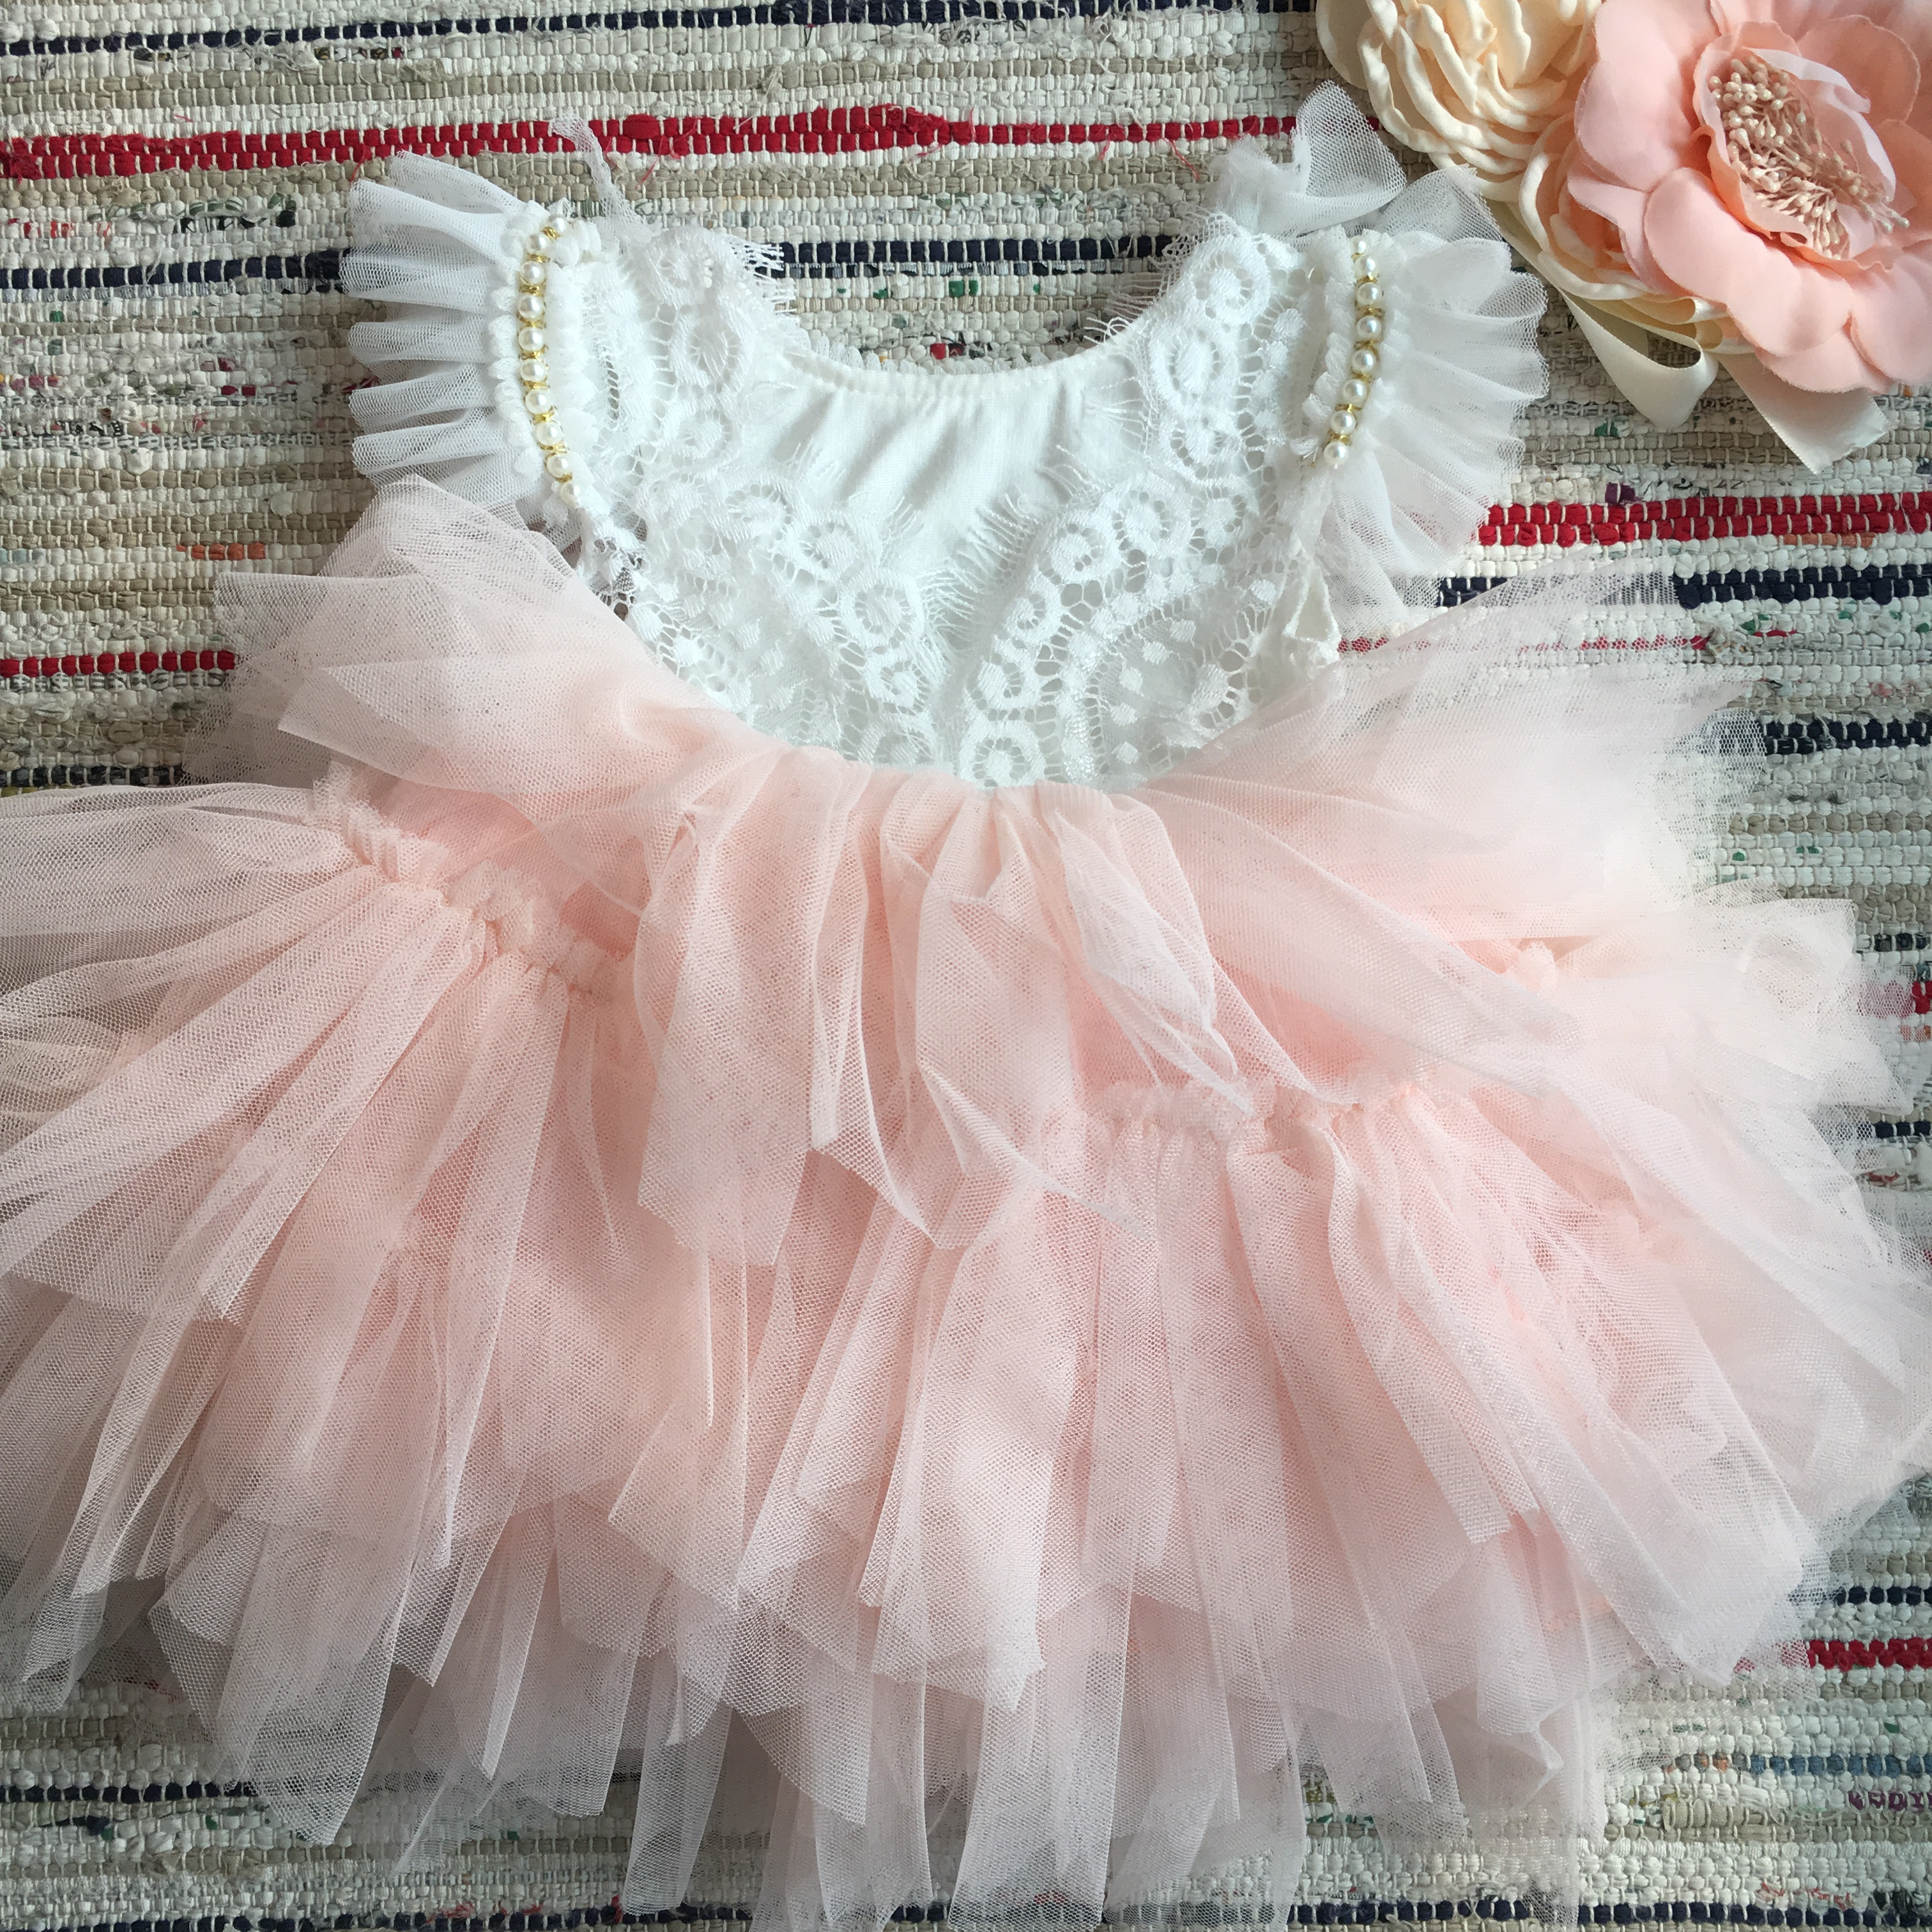 Beautiful flower girls wedding dress children party tutu gown for kids children flowers sashes princess sling summer dress 5